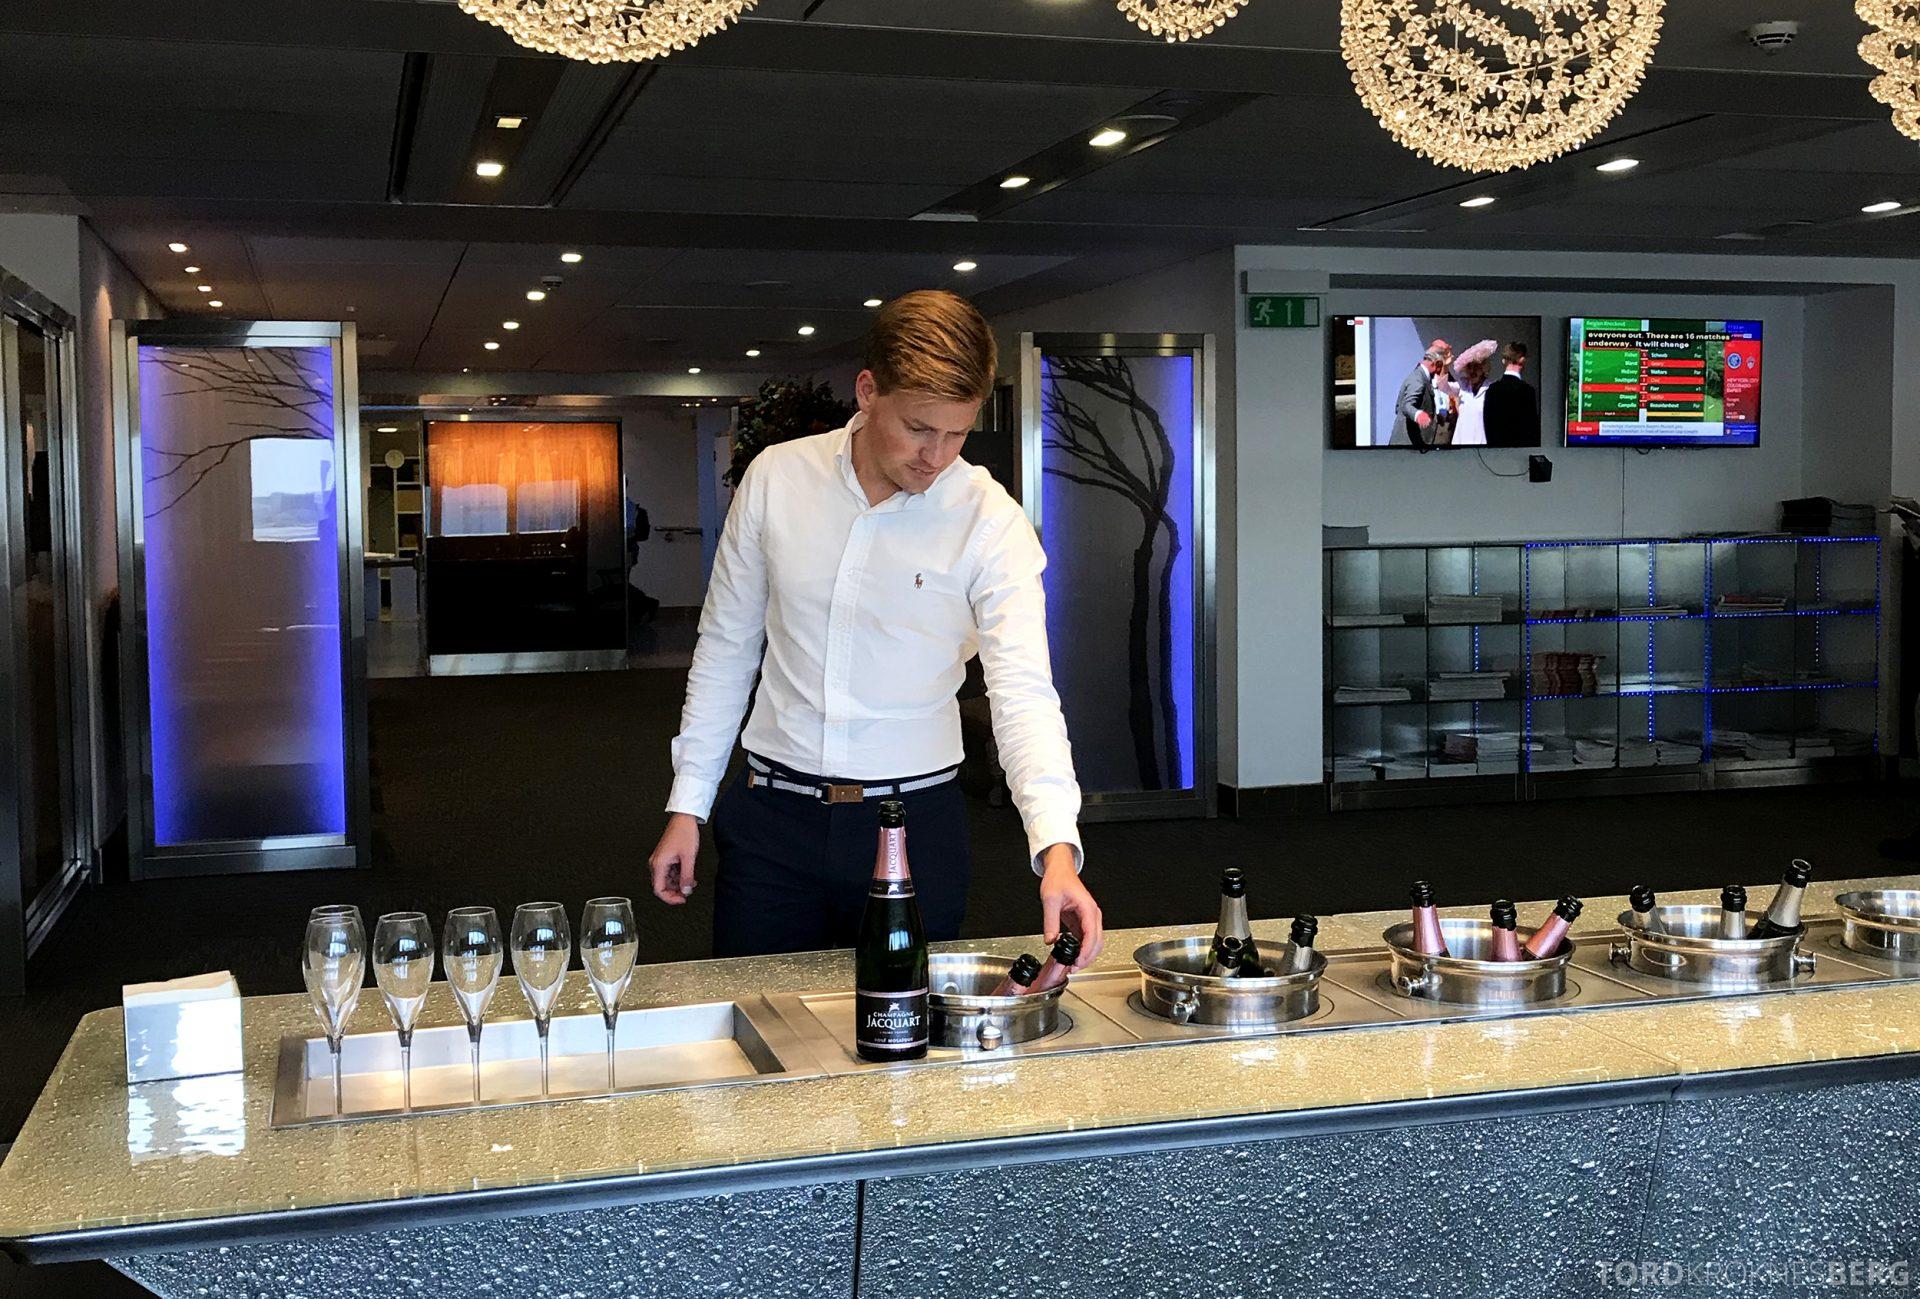 British Airways Galleries First Lounge Heathrow Tord Kroknes Berg champagne 2